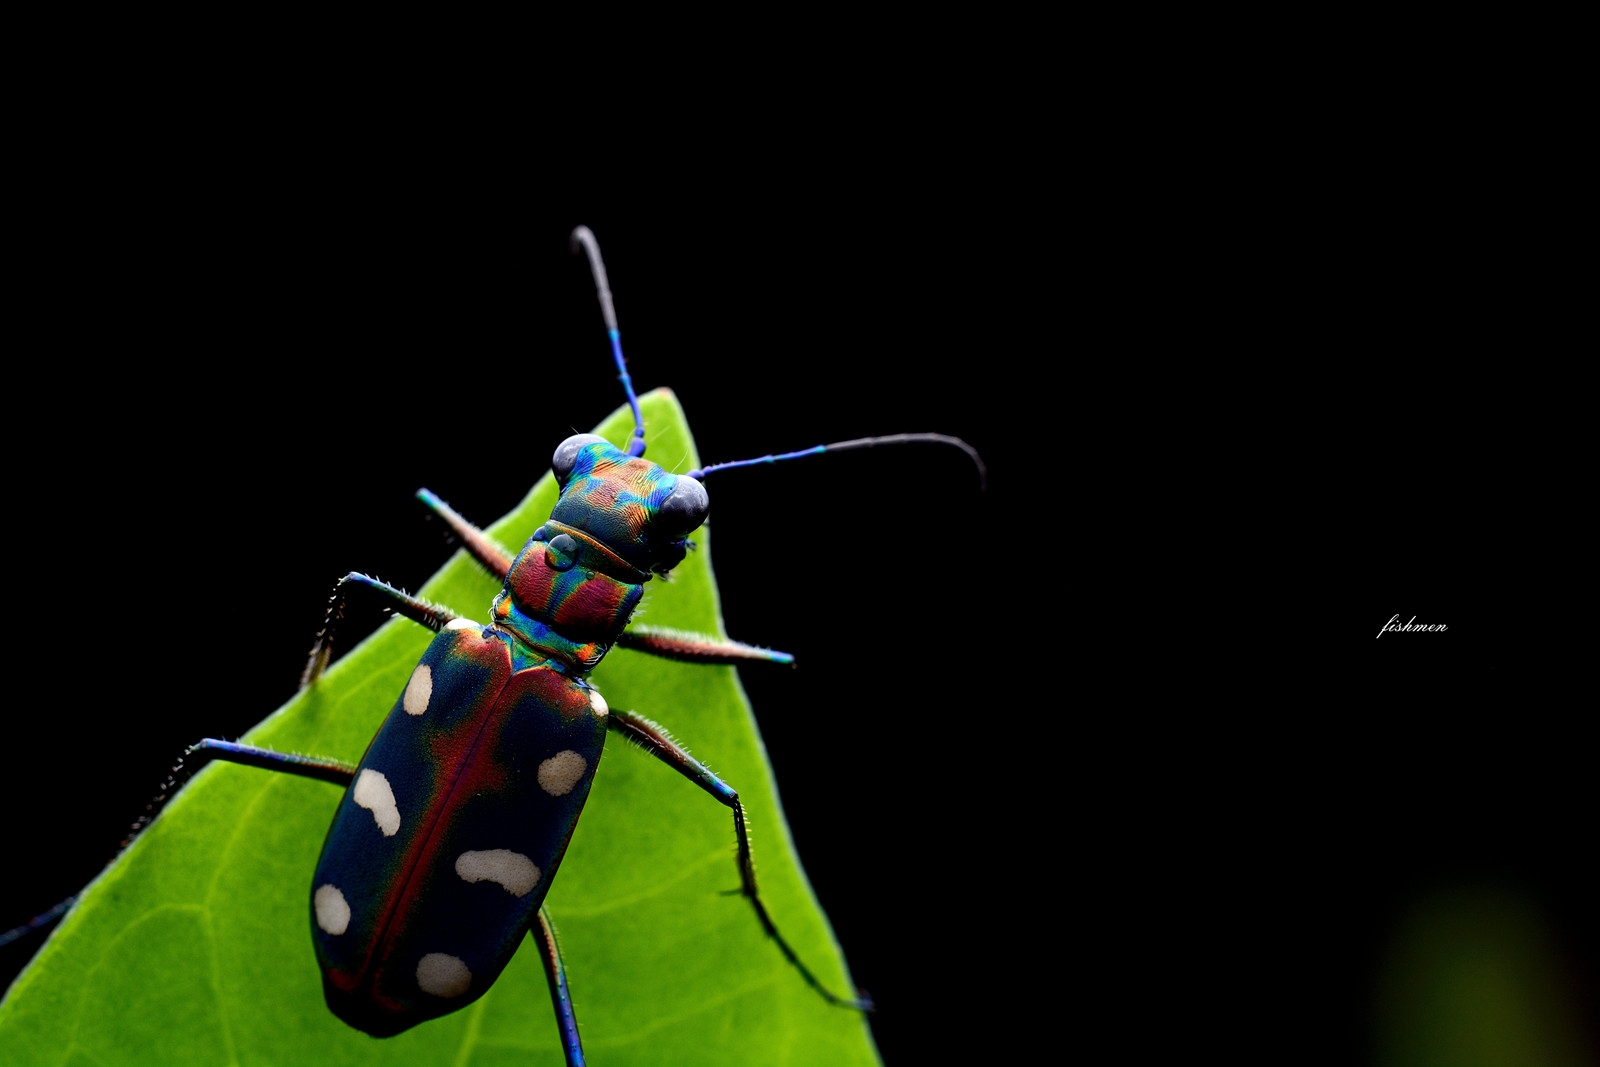 fishmen作品:微距的精彩世界